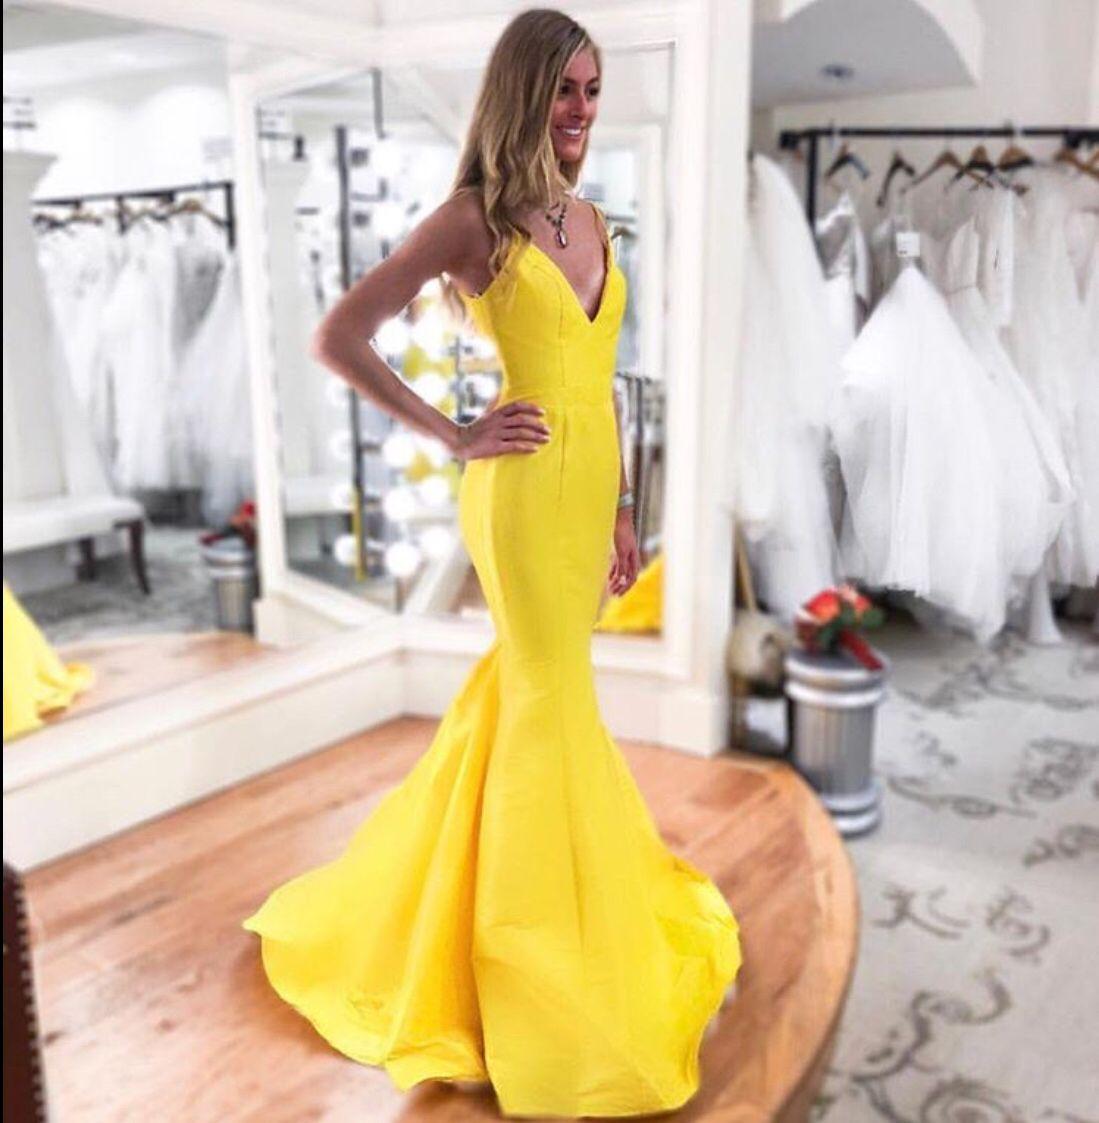 Sunflower Yellow Prom Dress Prom Dresses Yellow Prom Dresses Dresses [ 1123 x 1099 Pixel ]